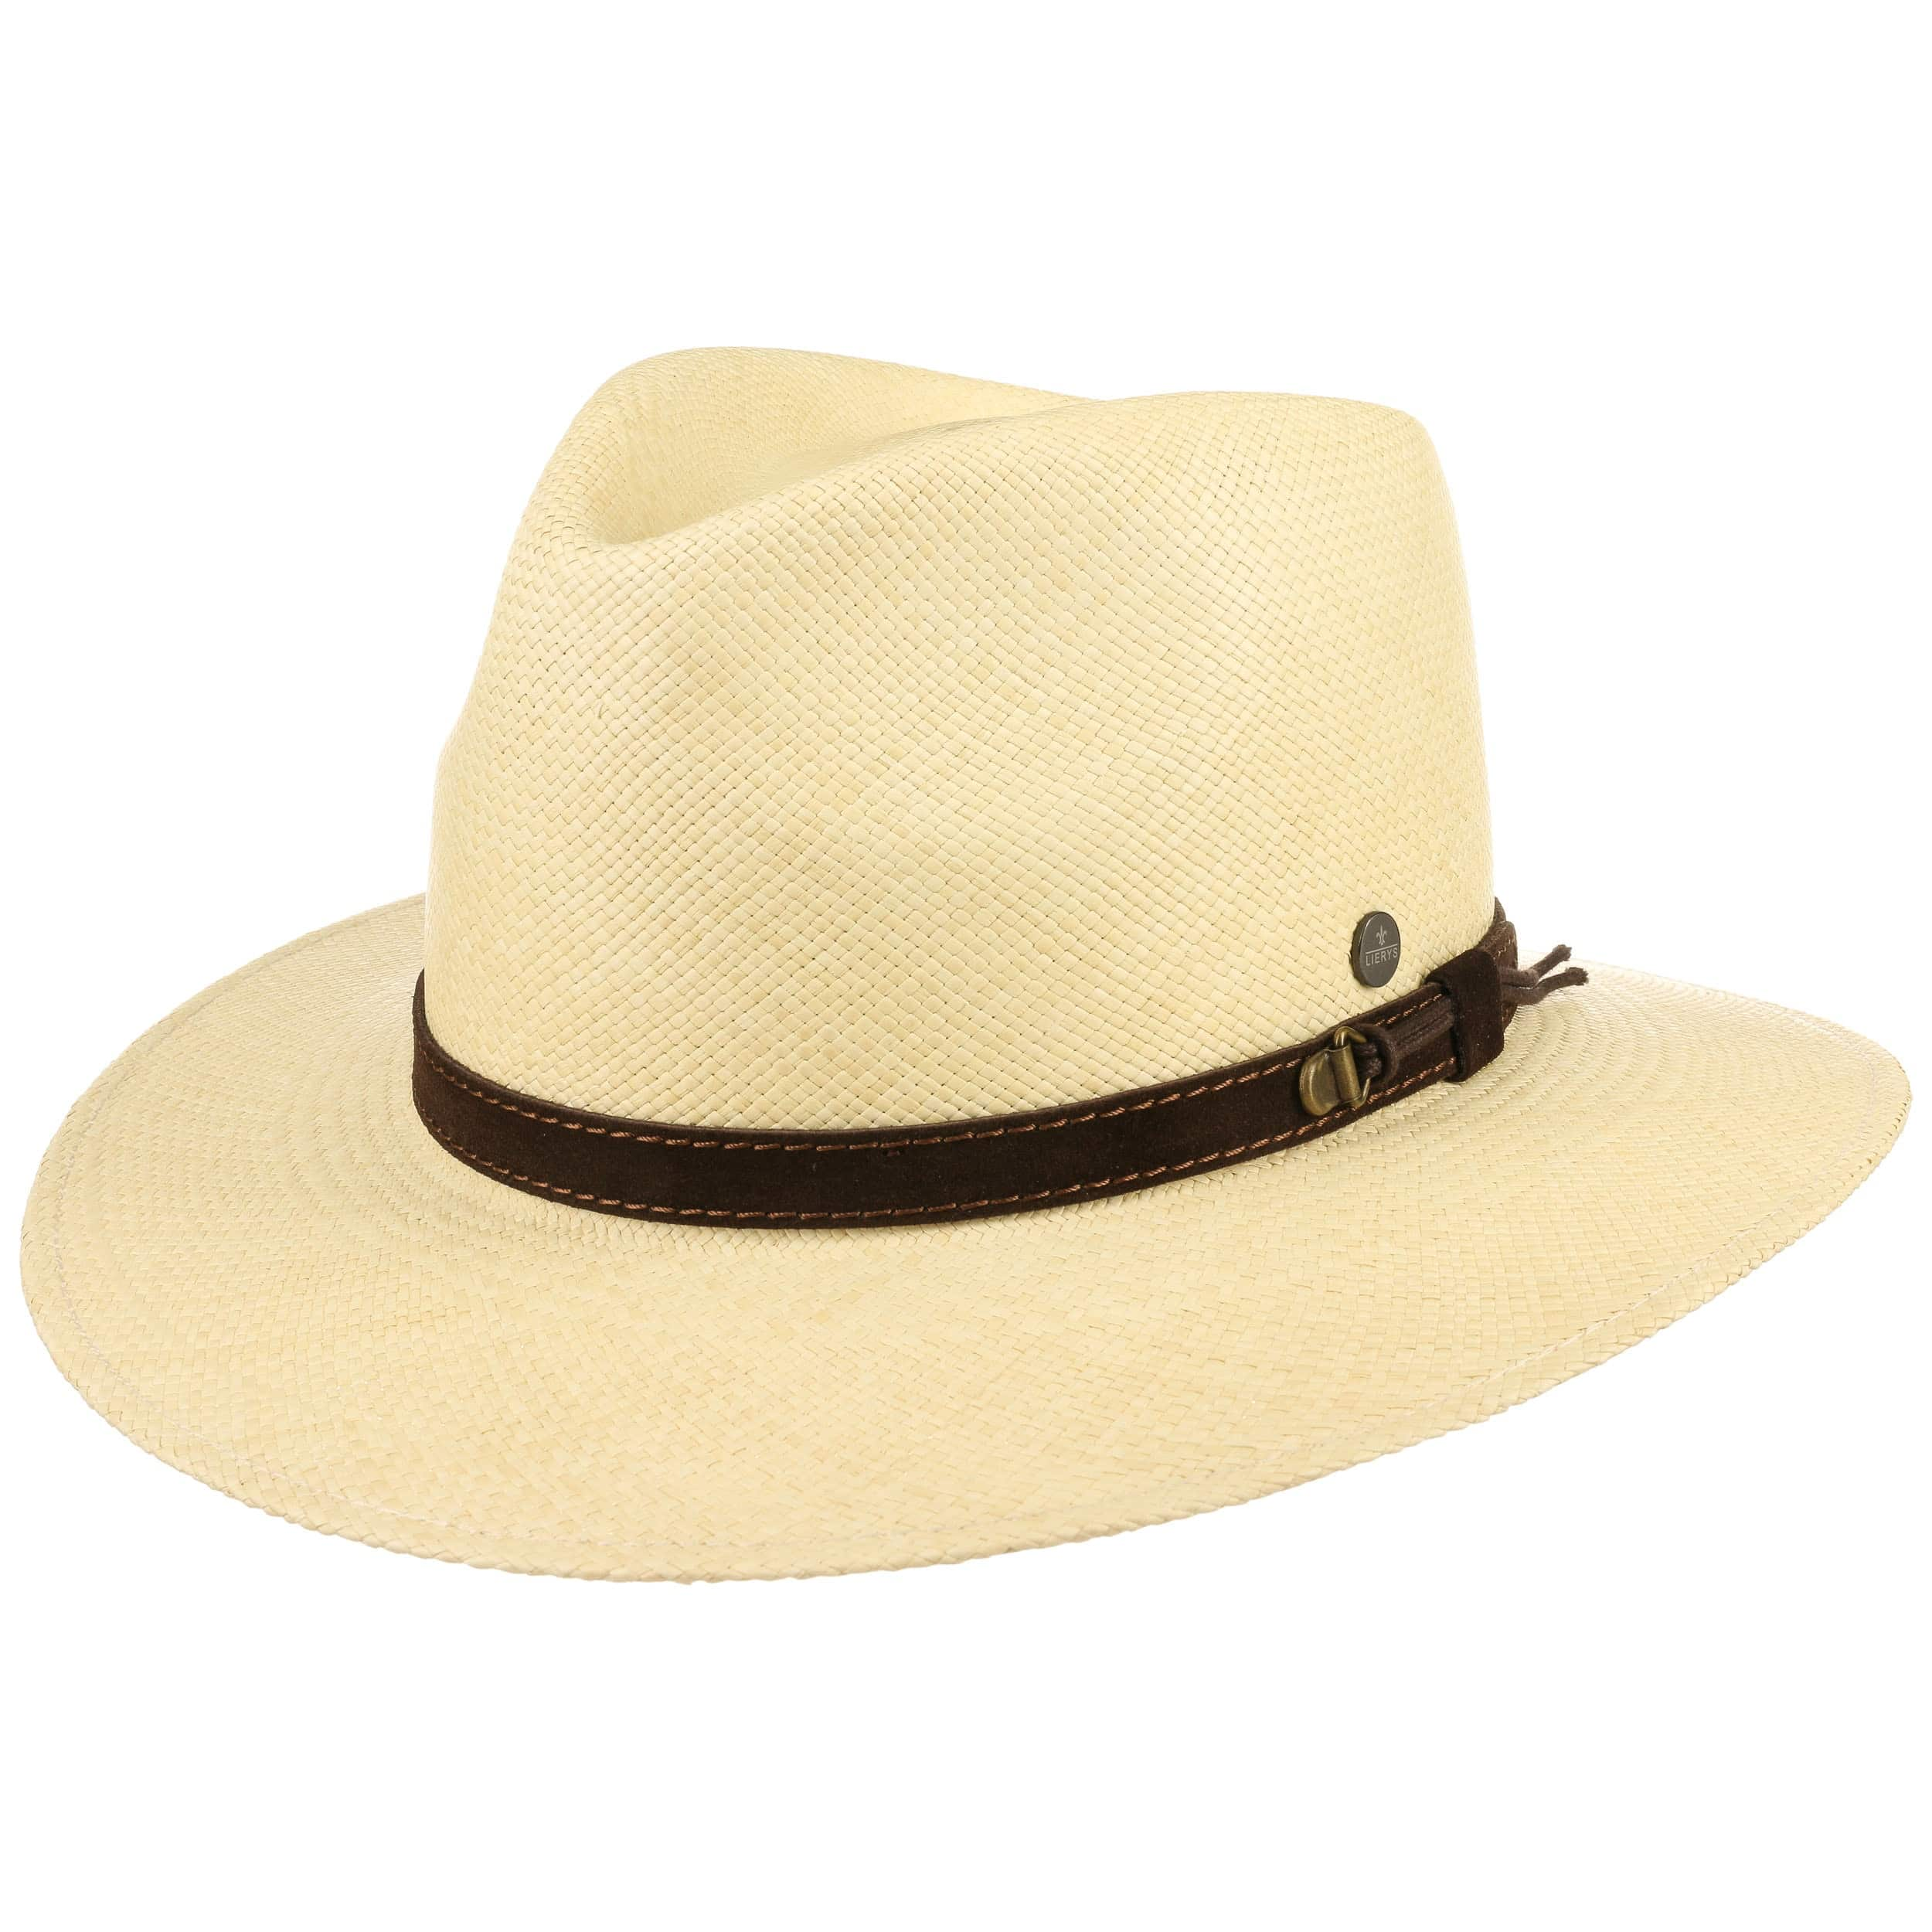 Sombrero Panamá The Striking by Lierys - Sombreros - sombreroshop.es ab5e0f5e728